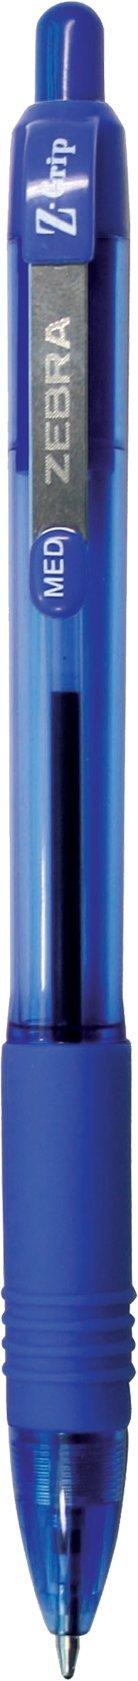 Zebra Pen Z-Grip Retractable Ballpoint Pen, Medium Point, 1.0mm, Blue Ink, 48-Count by Zebra Pen (Image #3)